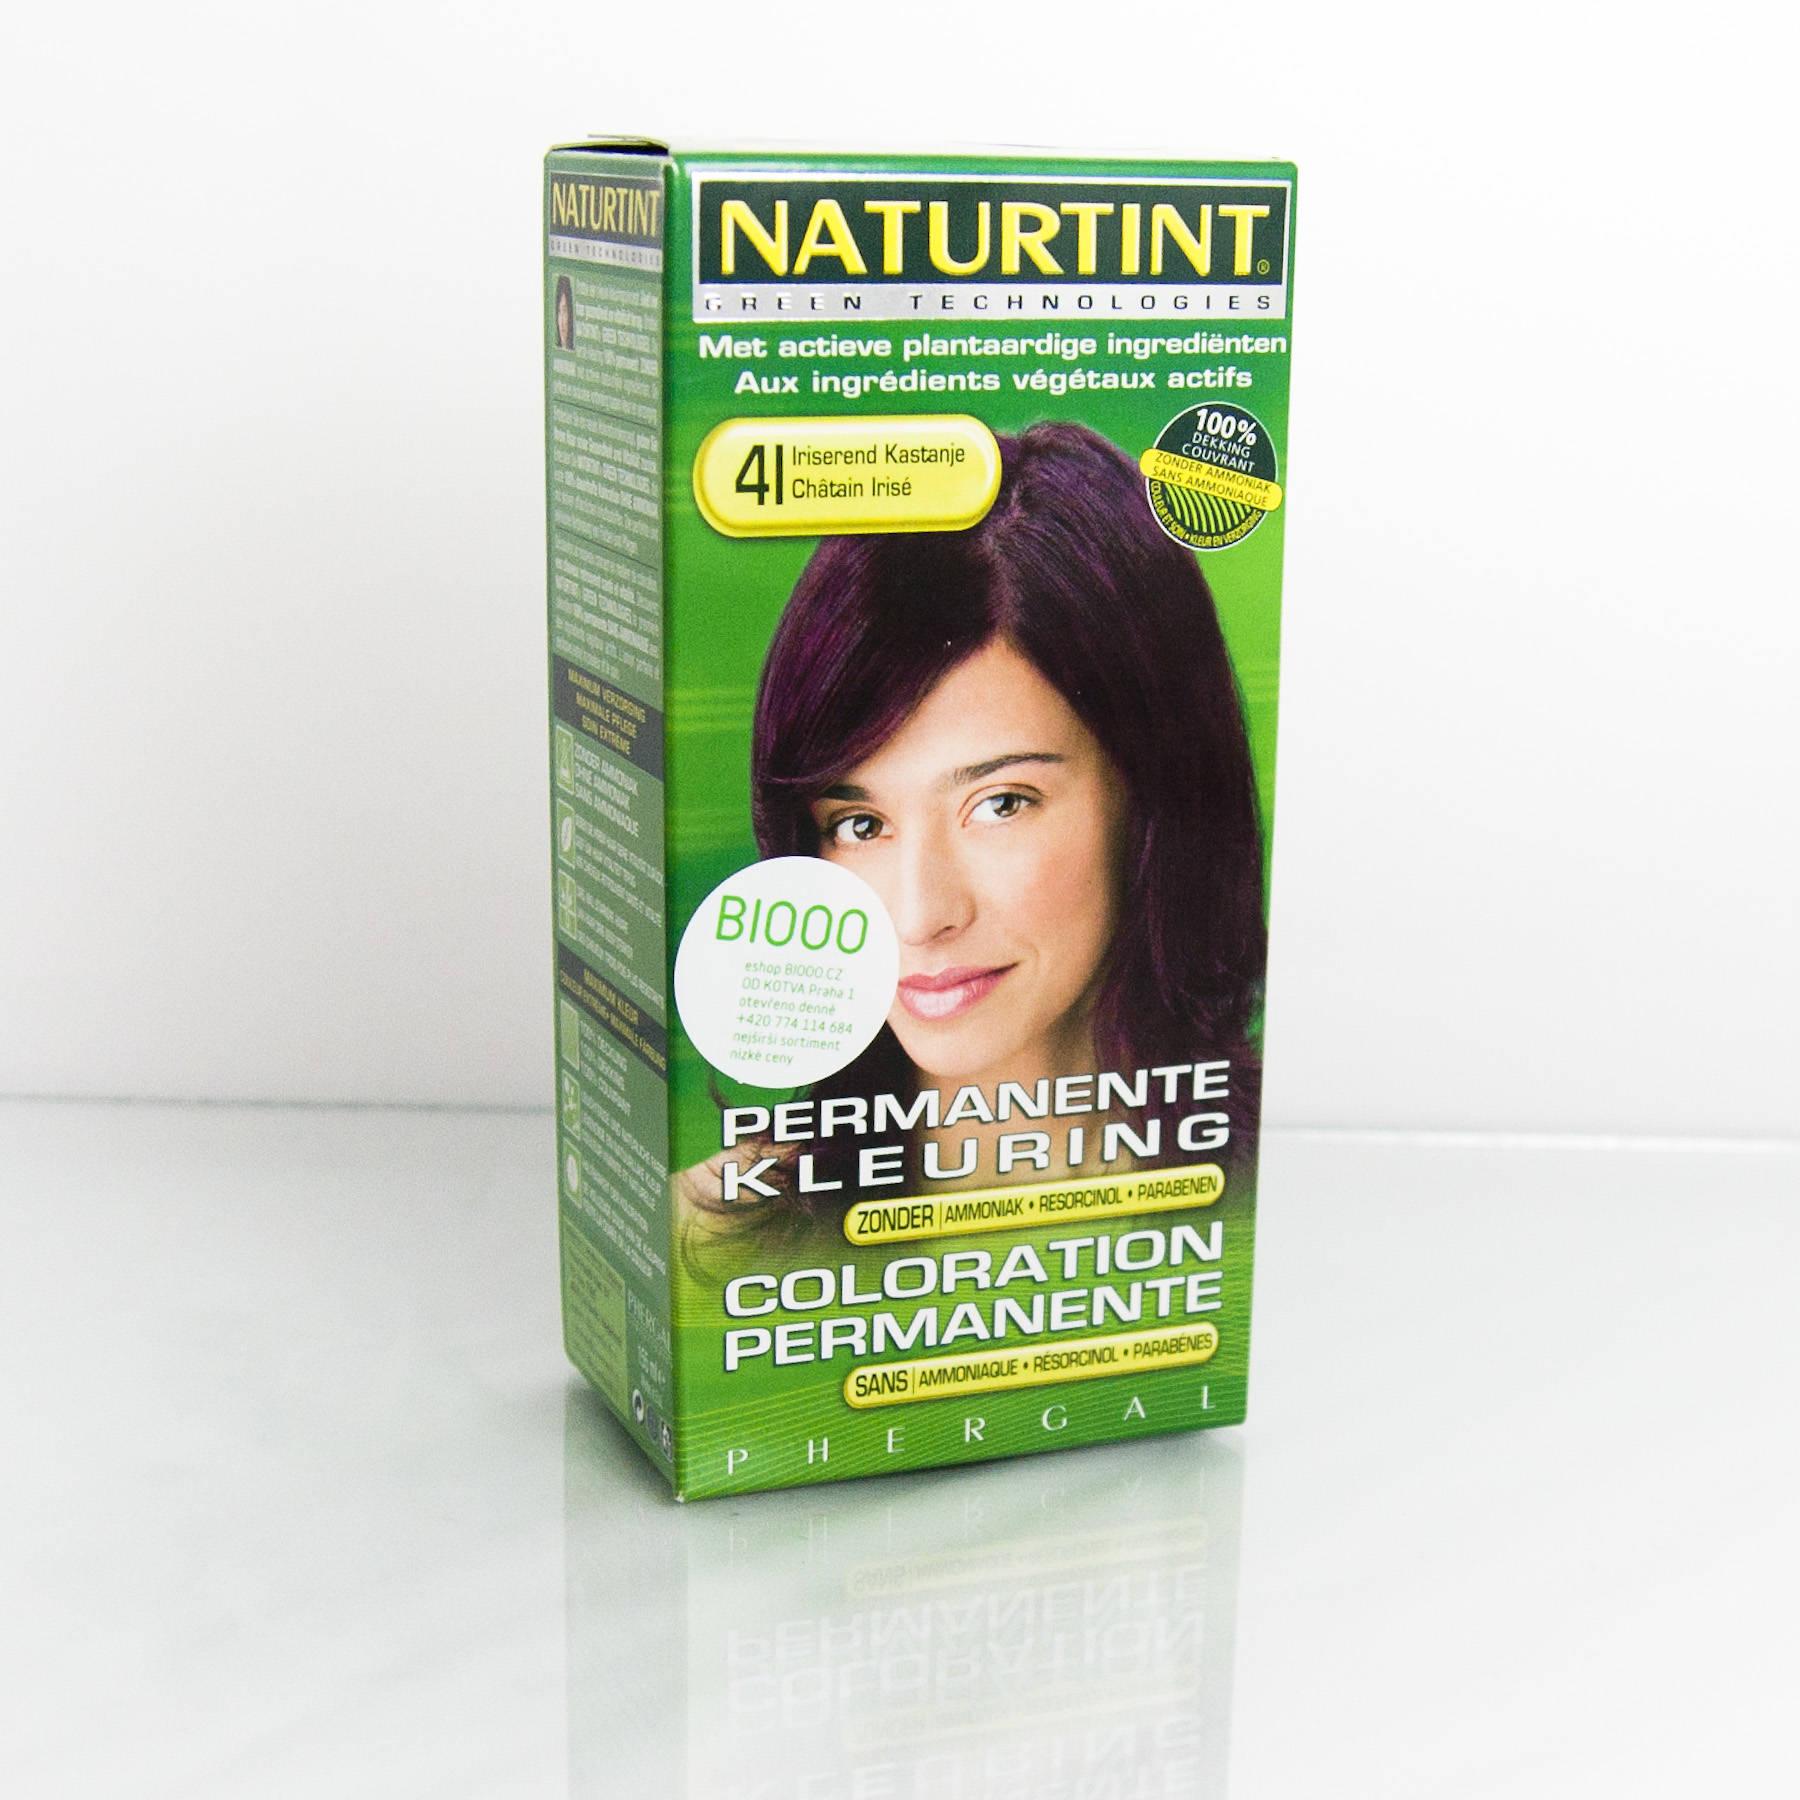 Naturtint Barva na vlasy 4I irisová kaštanová 165 ml